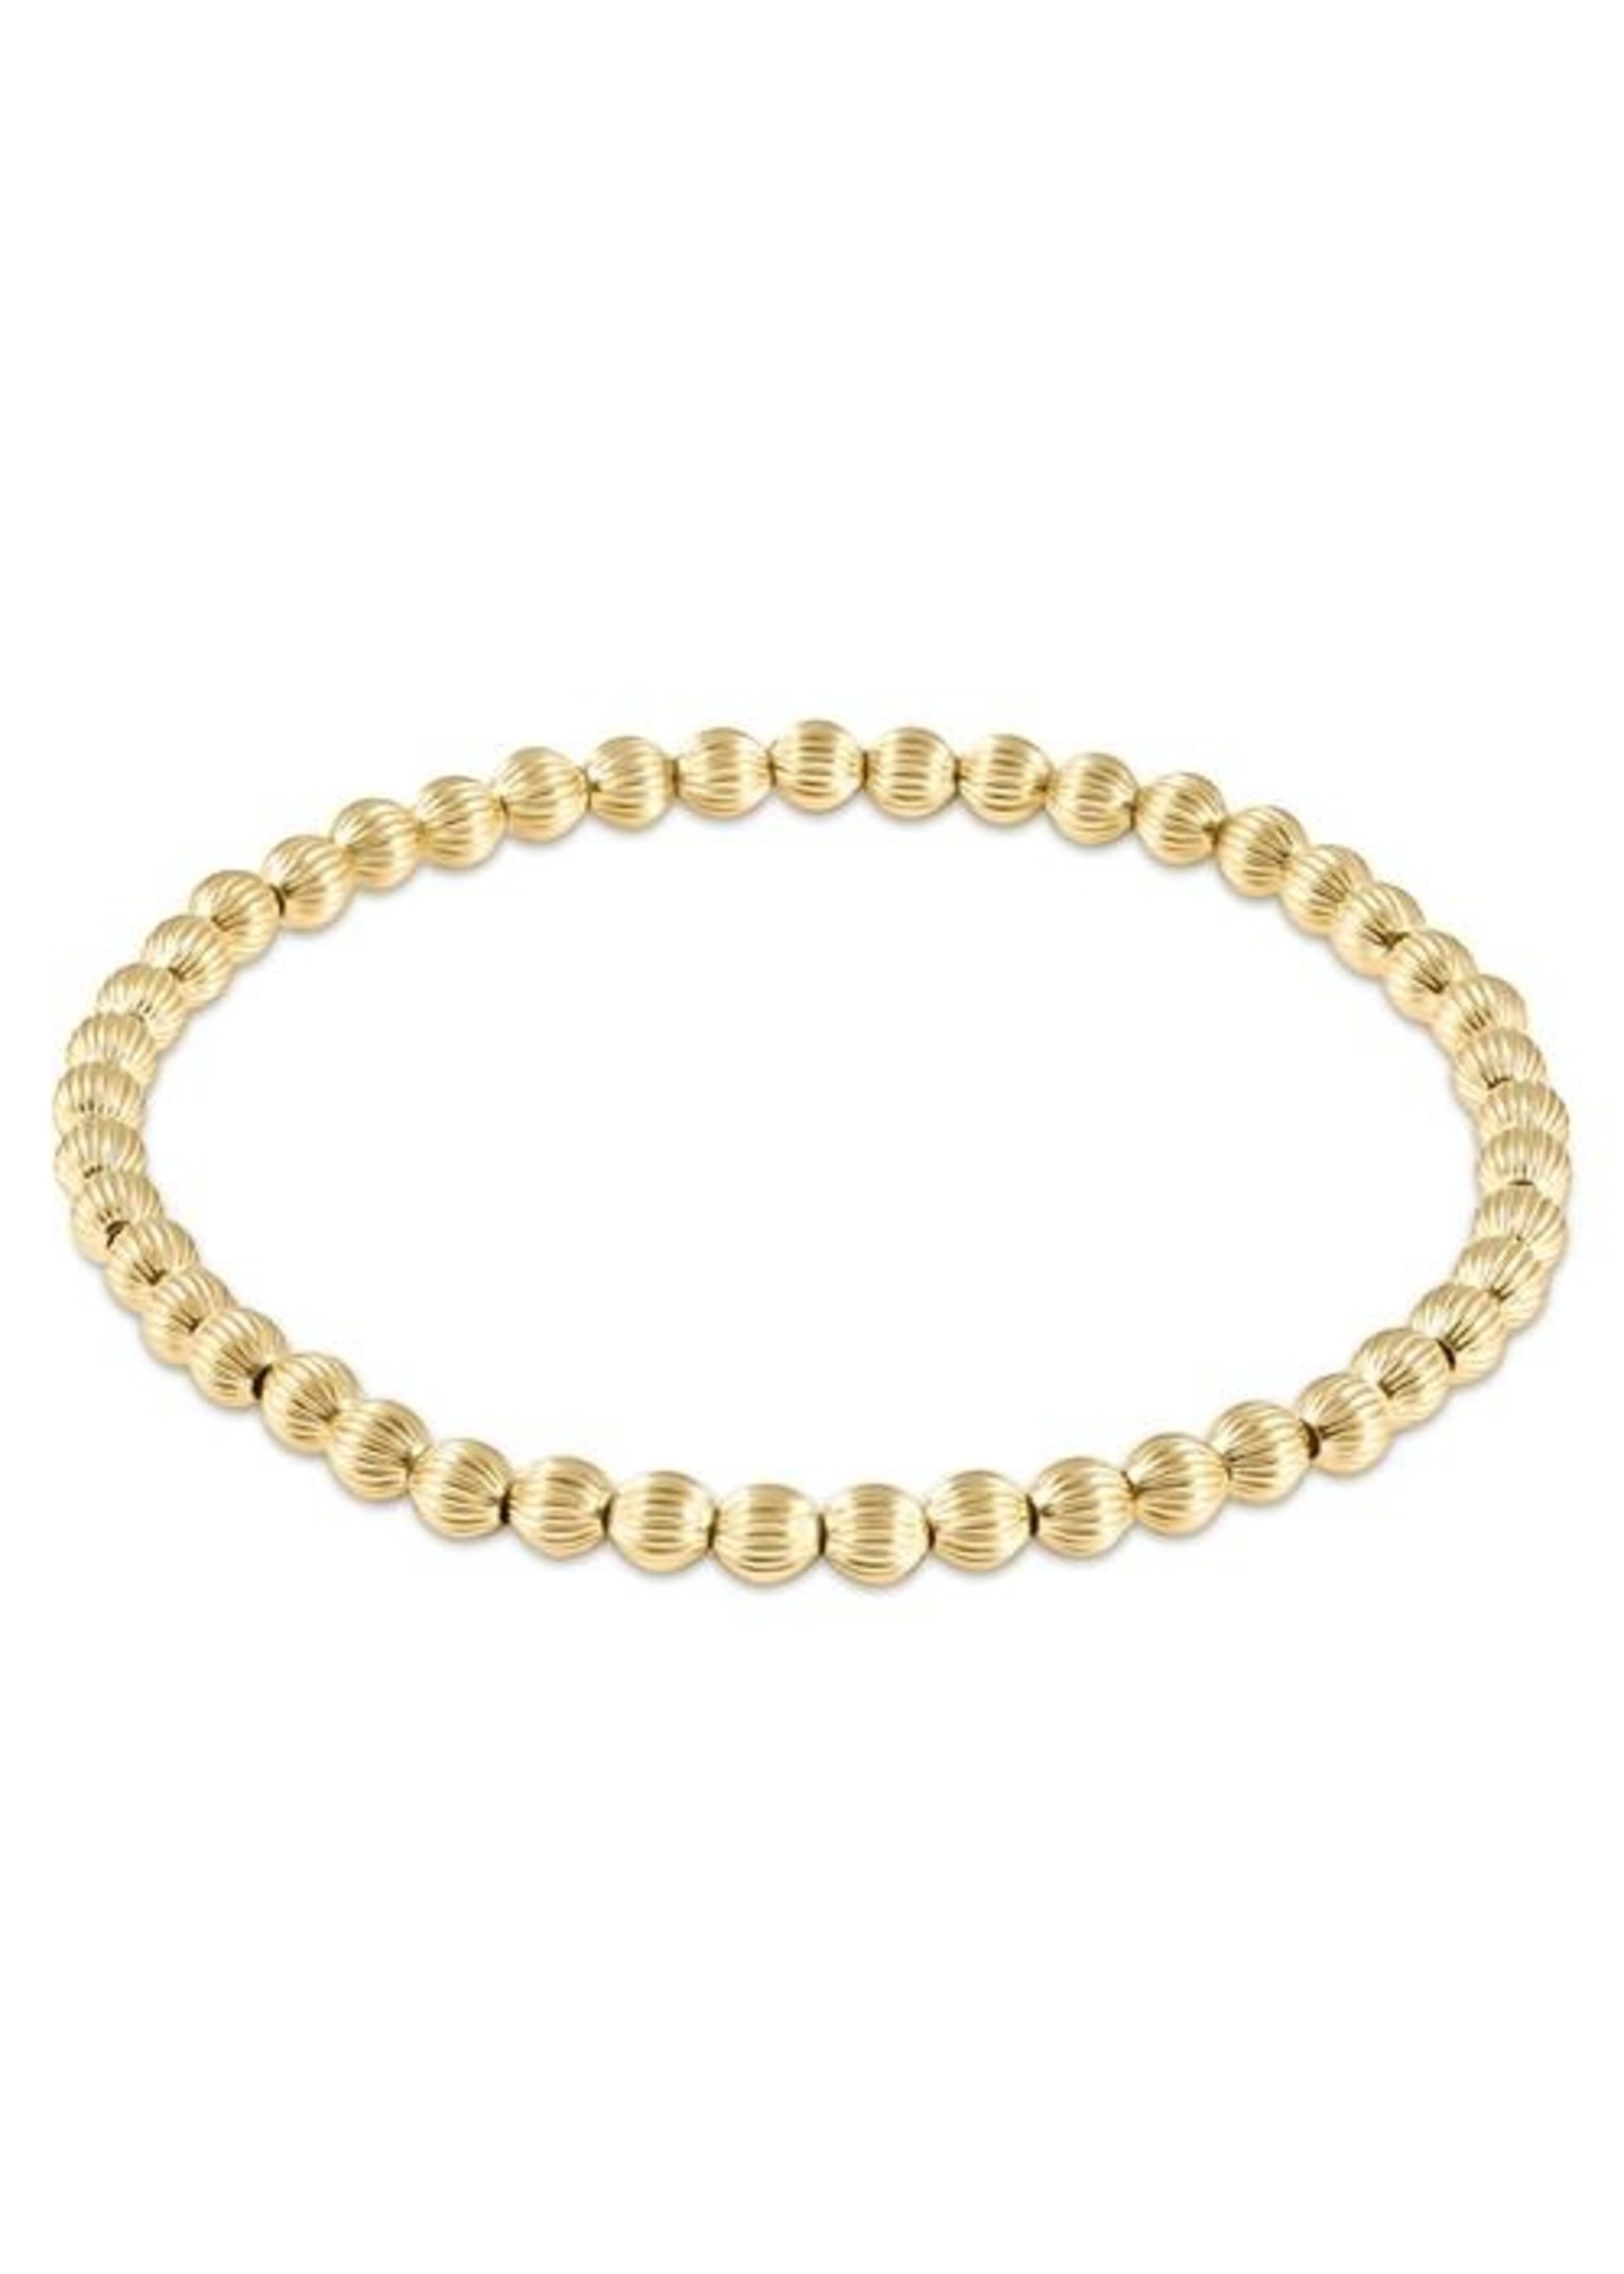 enewton Dignity Gold 4mm Bead Bracelet